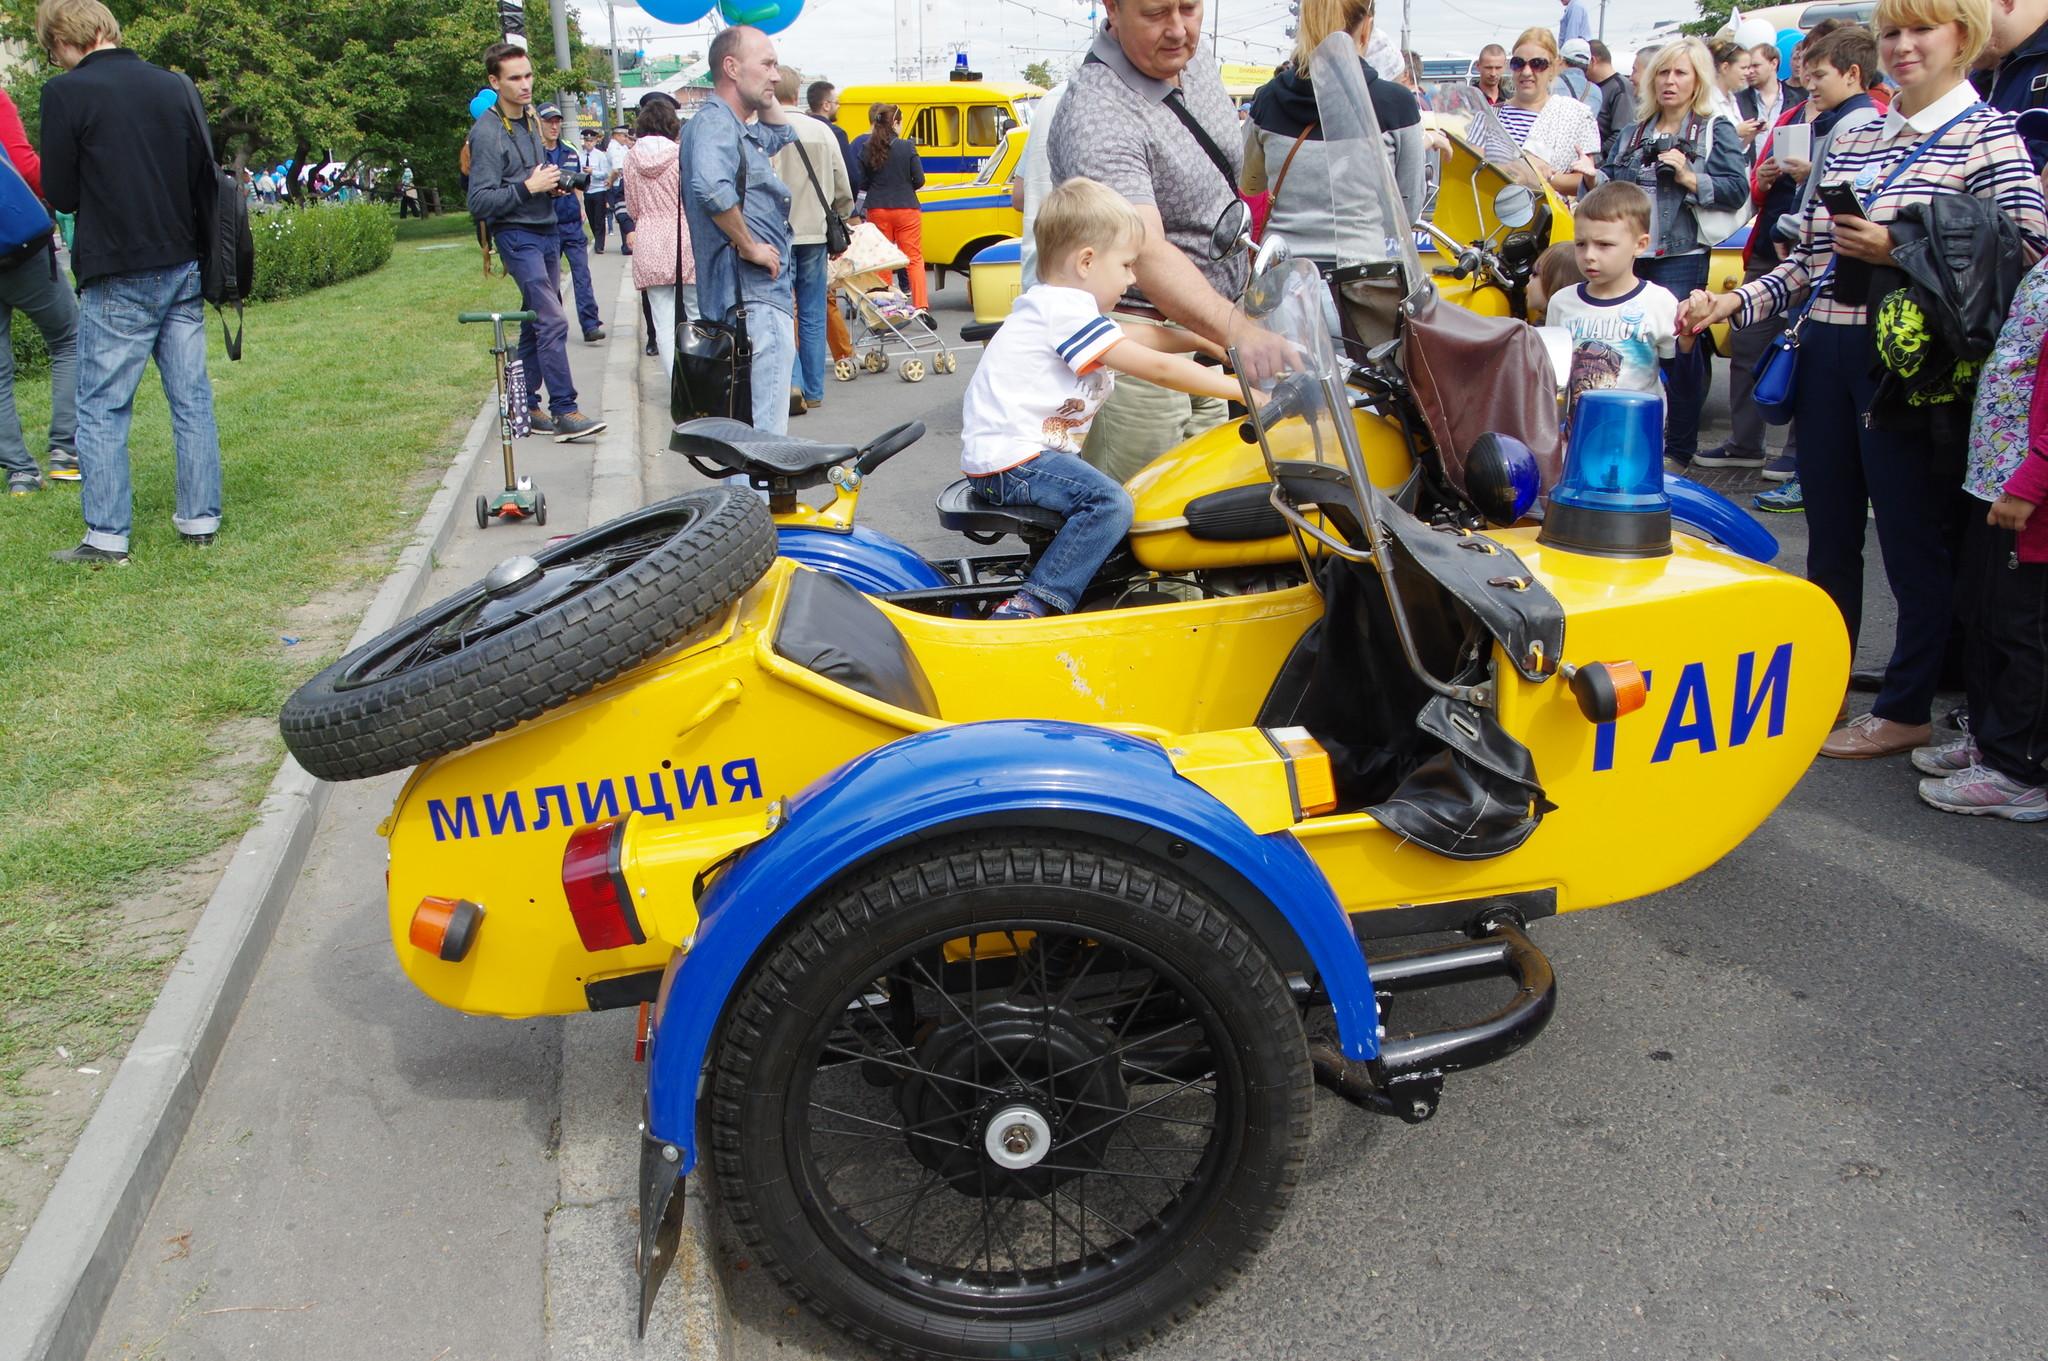 Милицейский мотоцикл